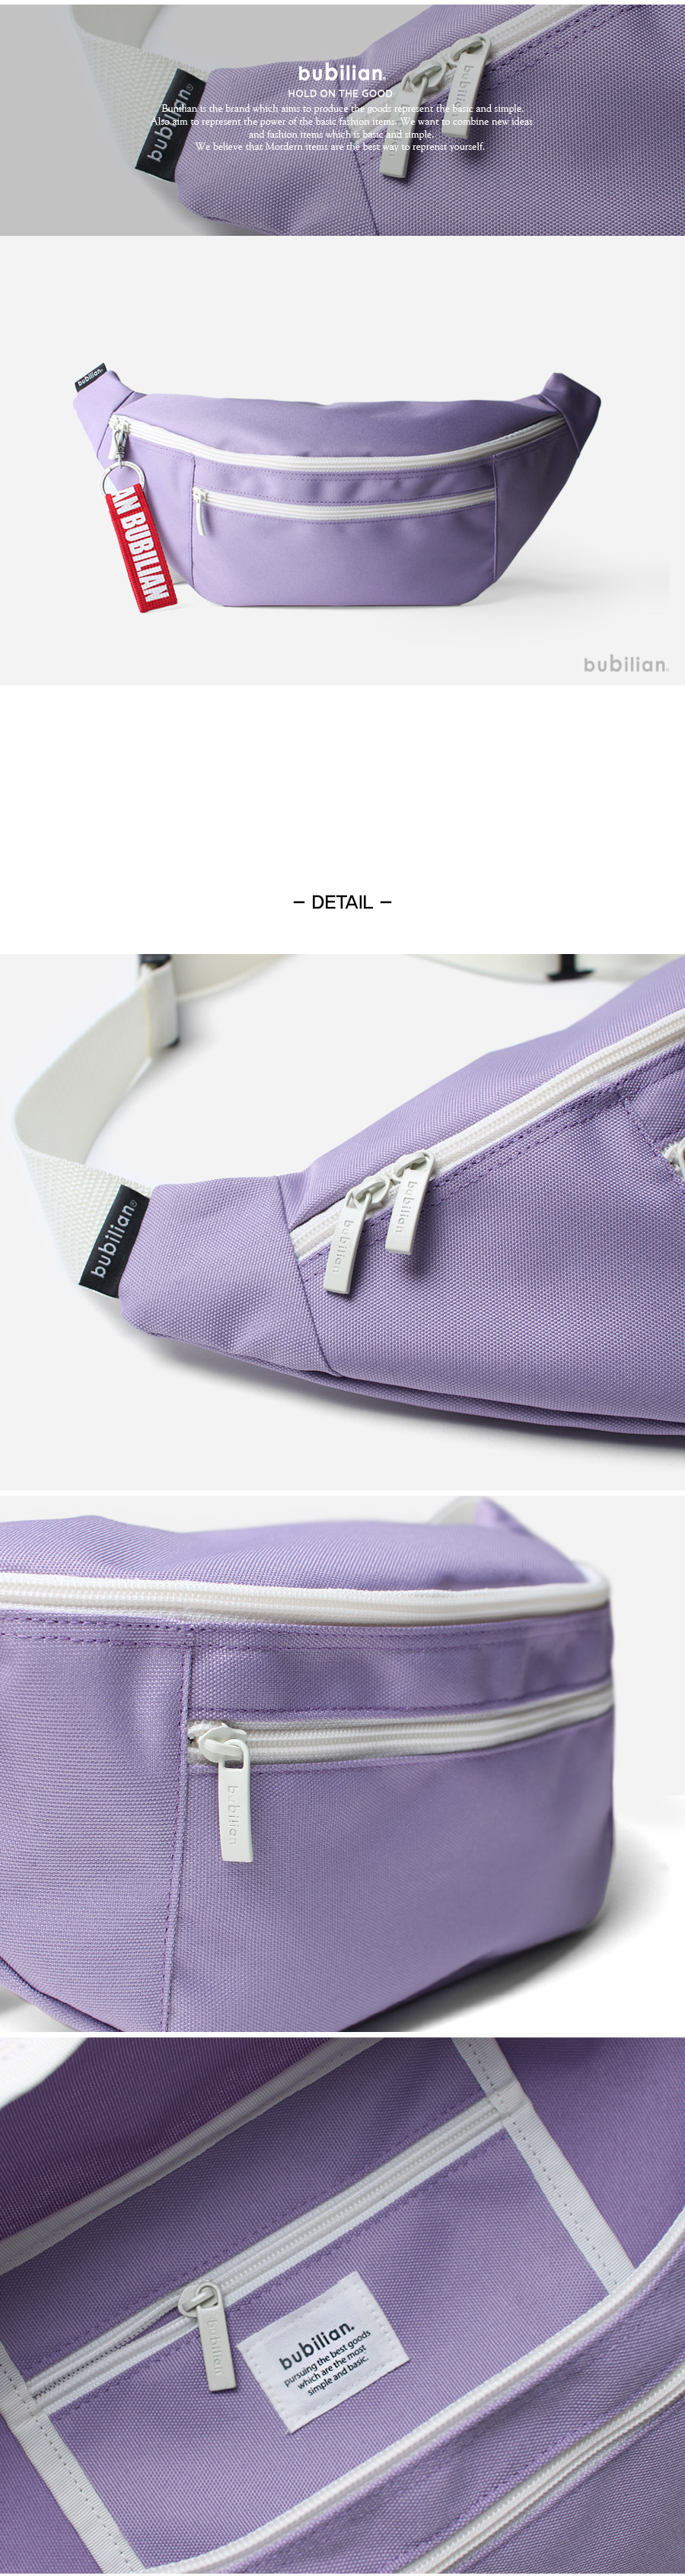 hipsack-lilac-3.jpg